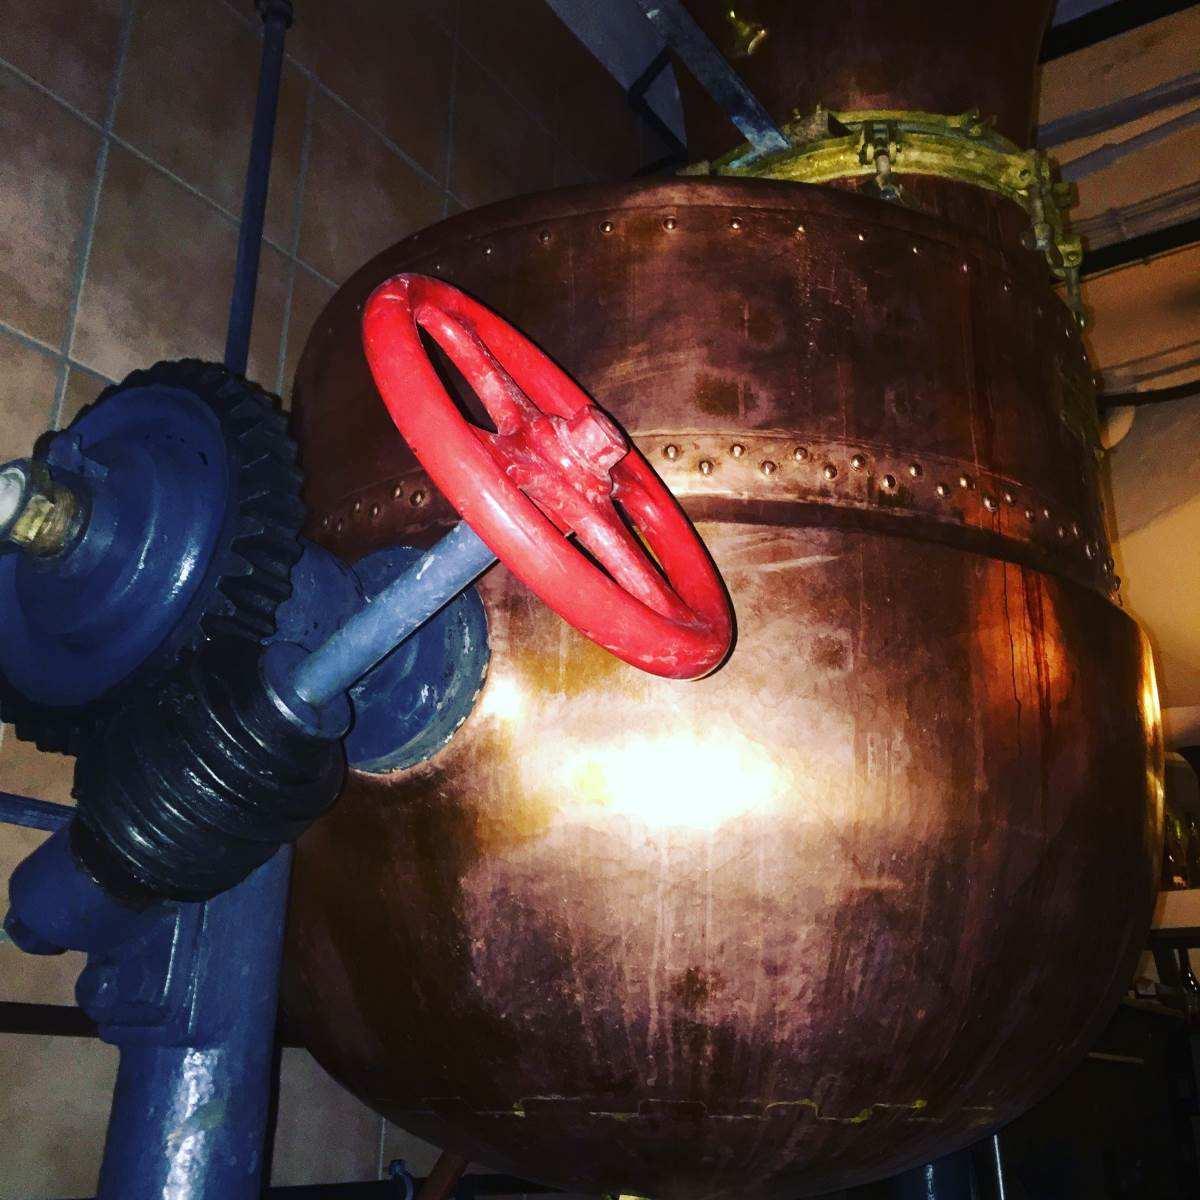 Alte Sammler Steingut Schnapps Flasche Old Germany Destillat Schiff Motiv Vitrin Buy One Give One Alte Berufe